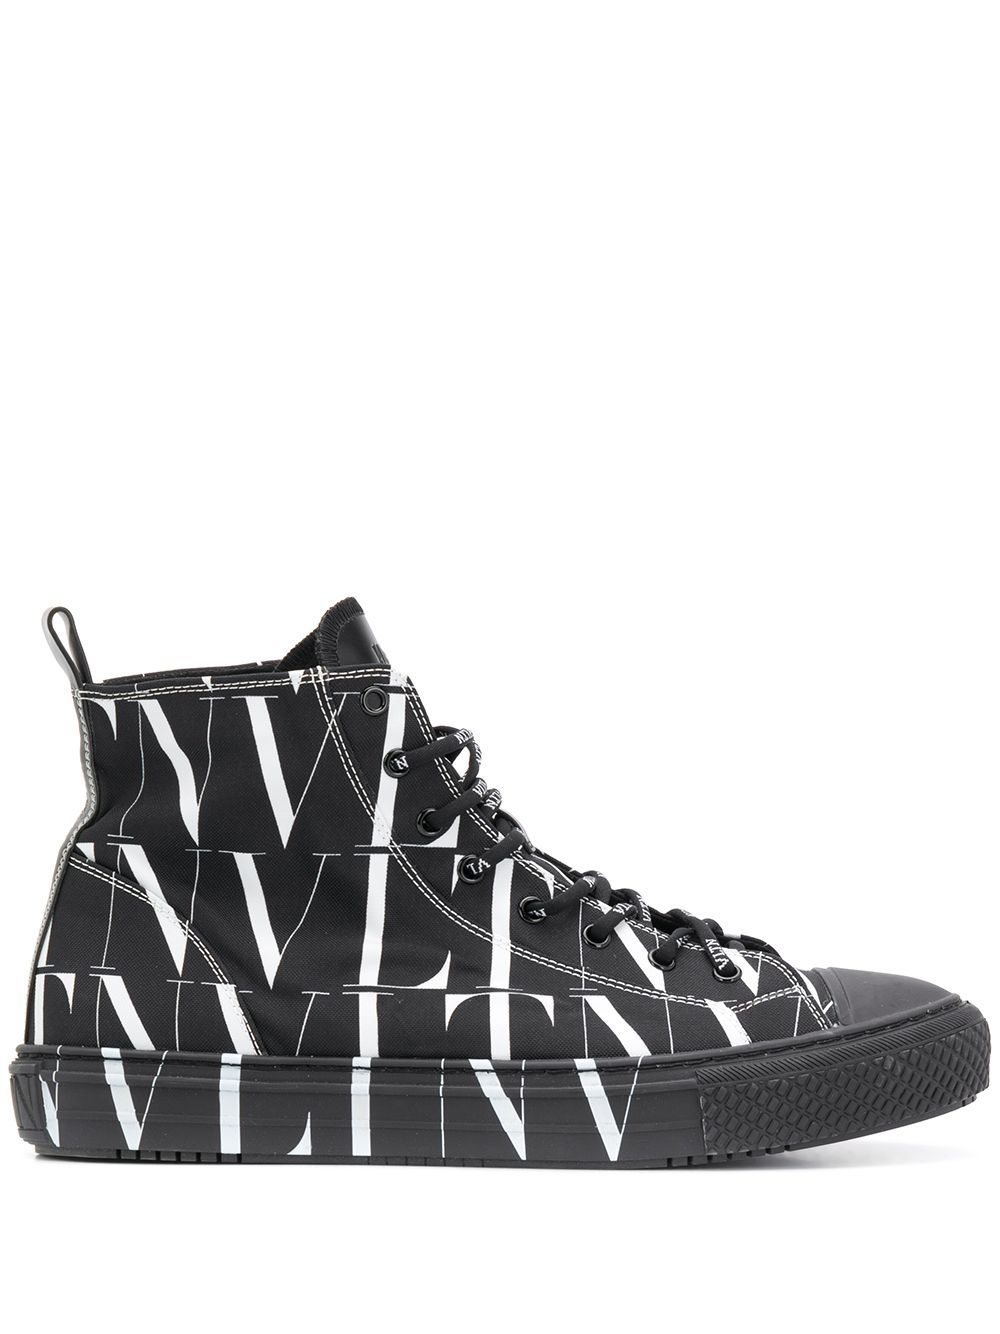 Sneaker giggies vltn times